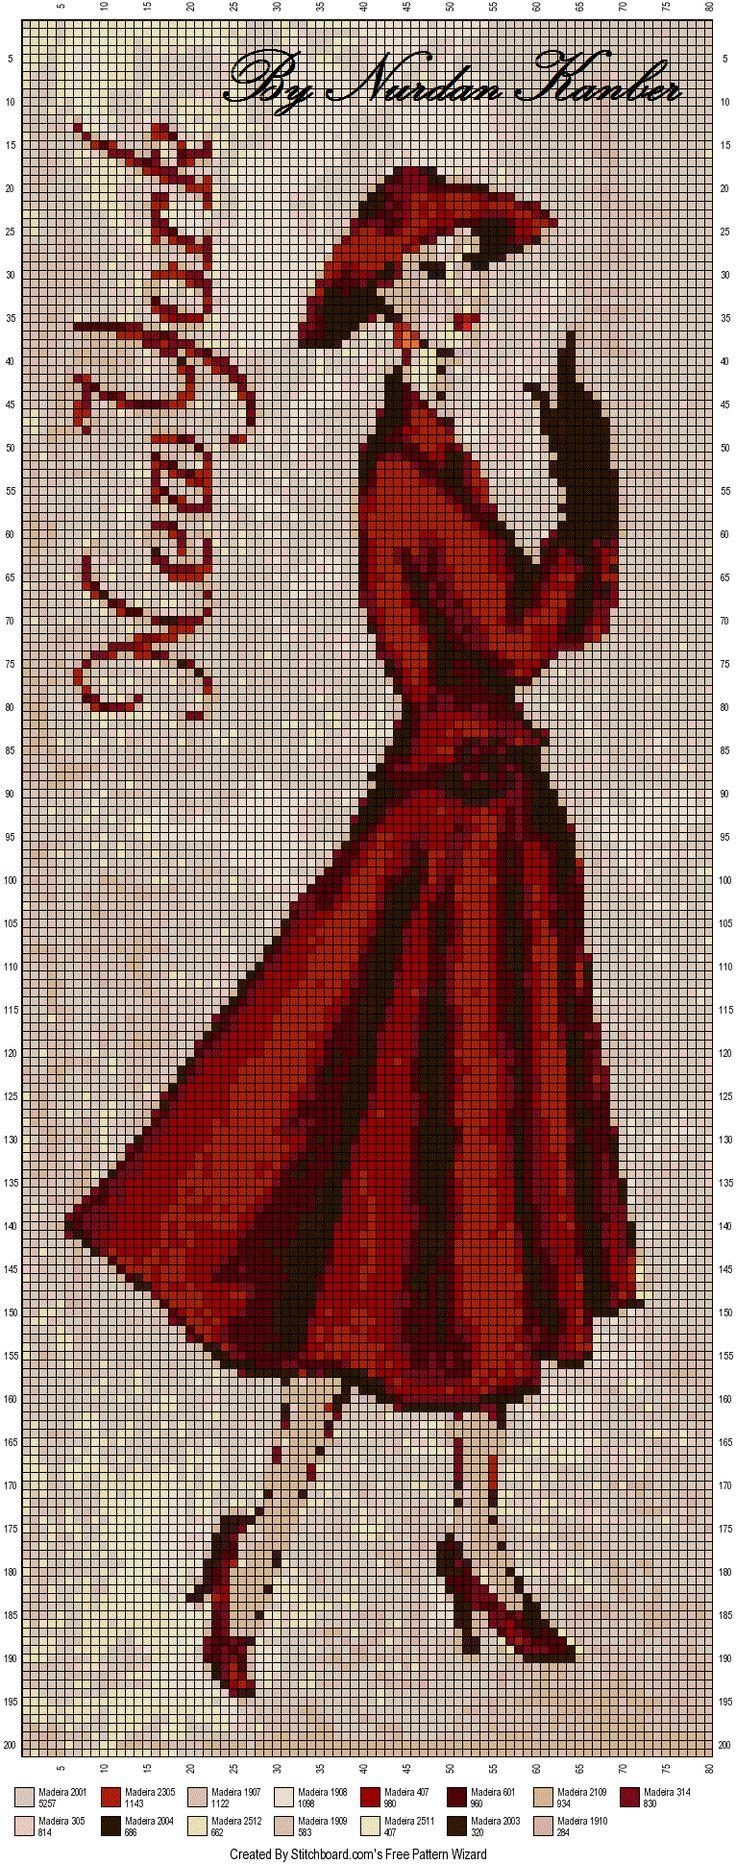 7a1f2dcb8b73dcc4750fa89c6b76c267.jpg (766×1940)